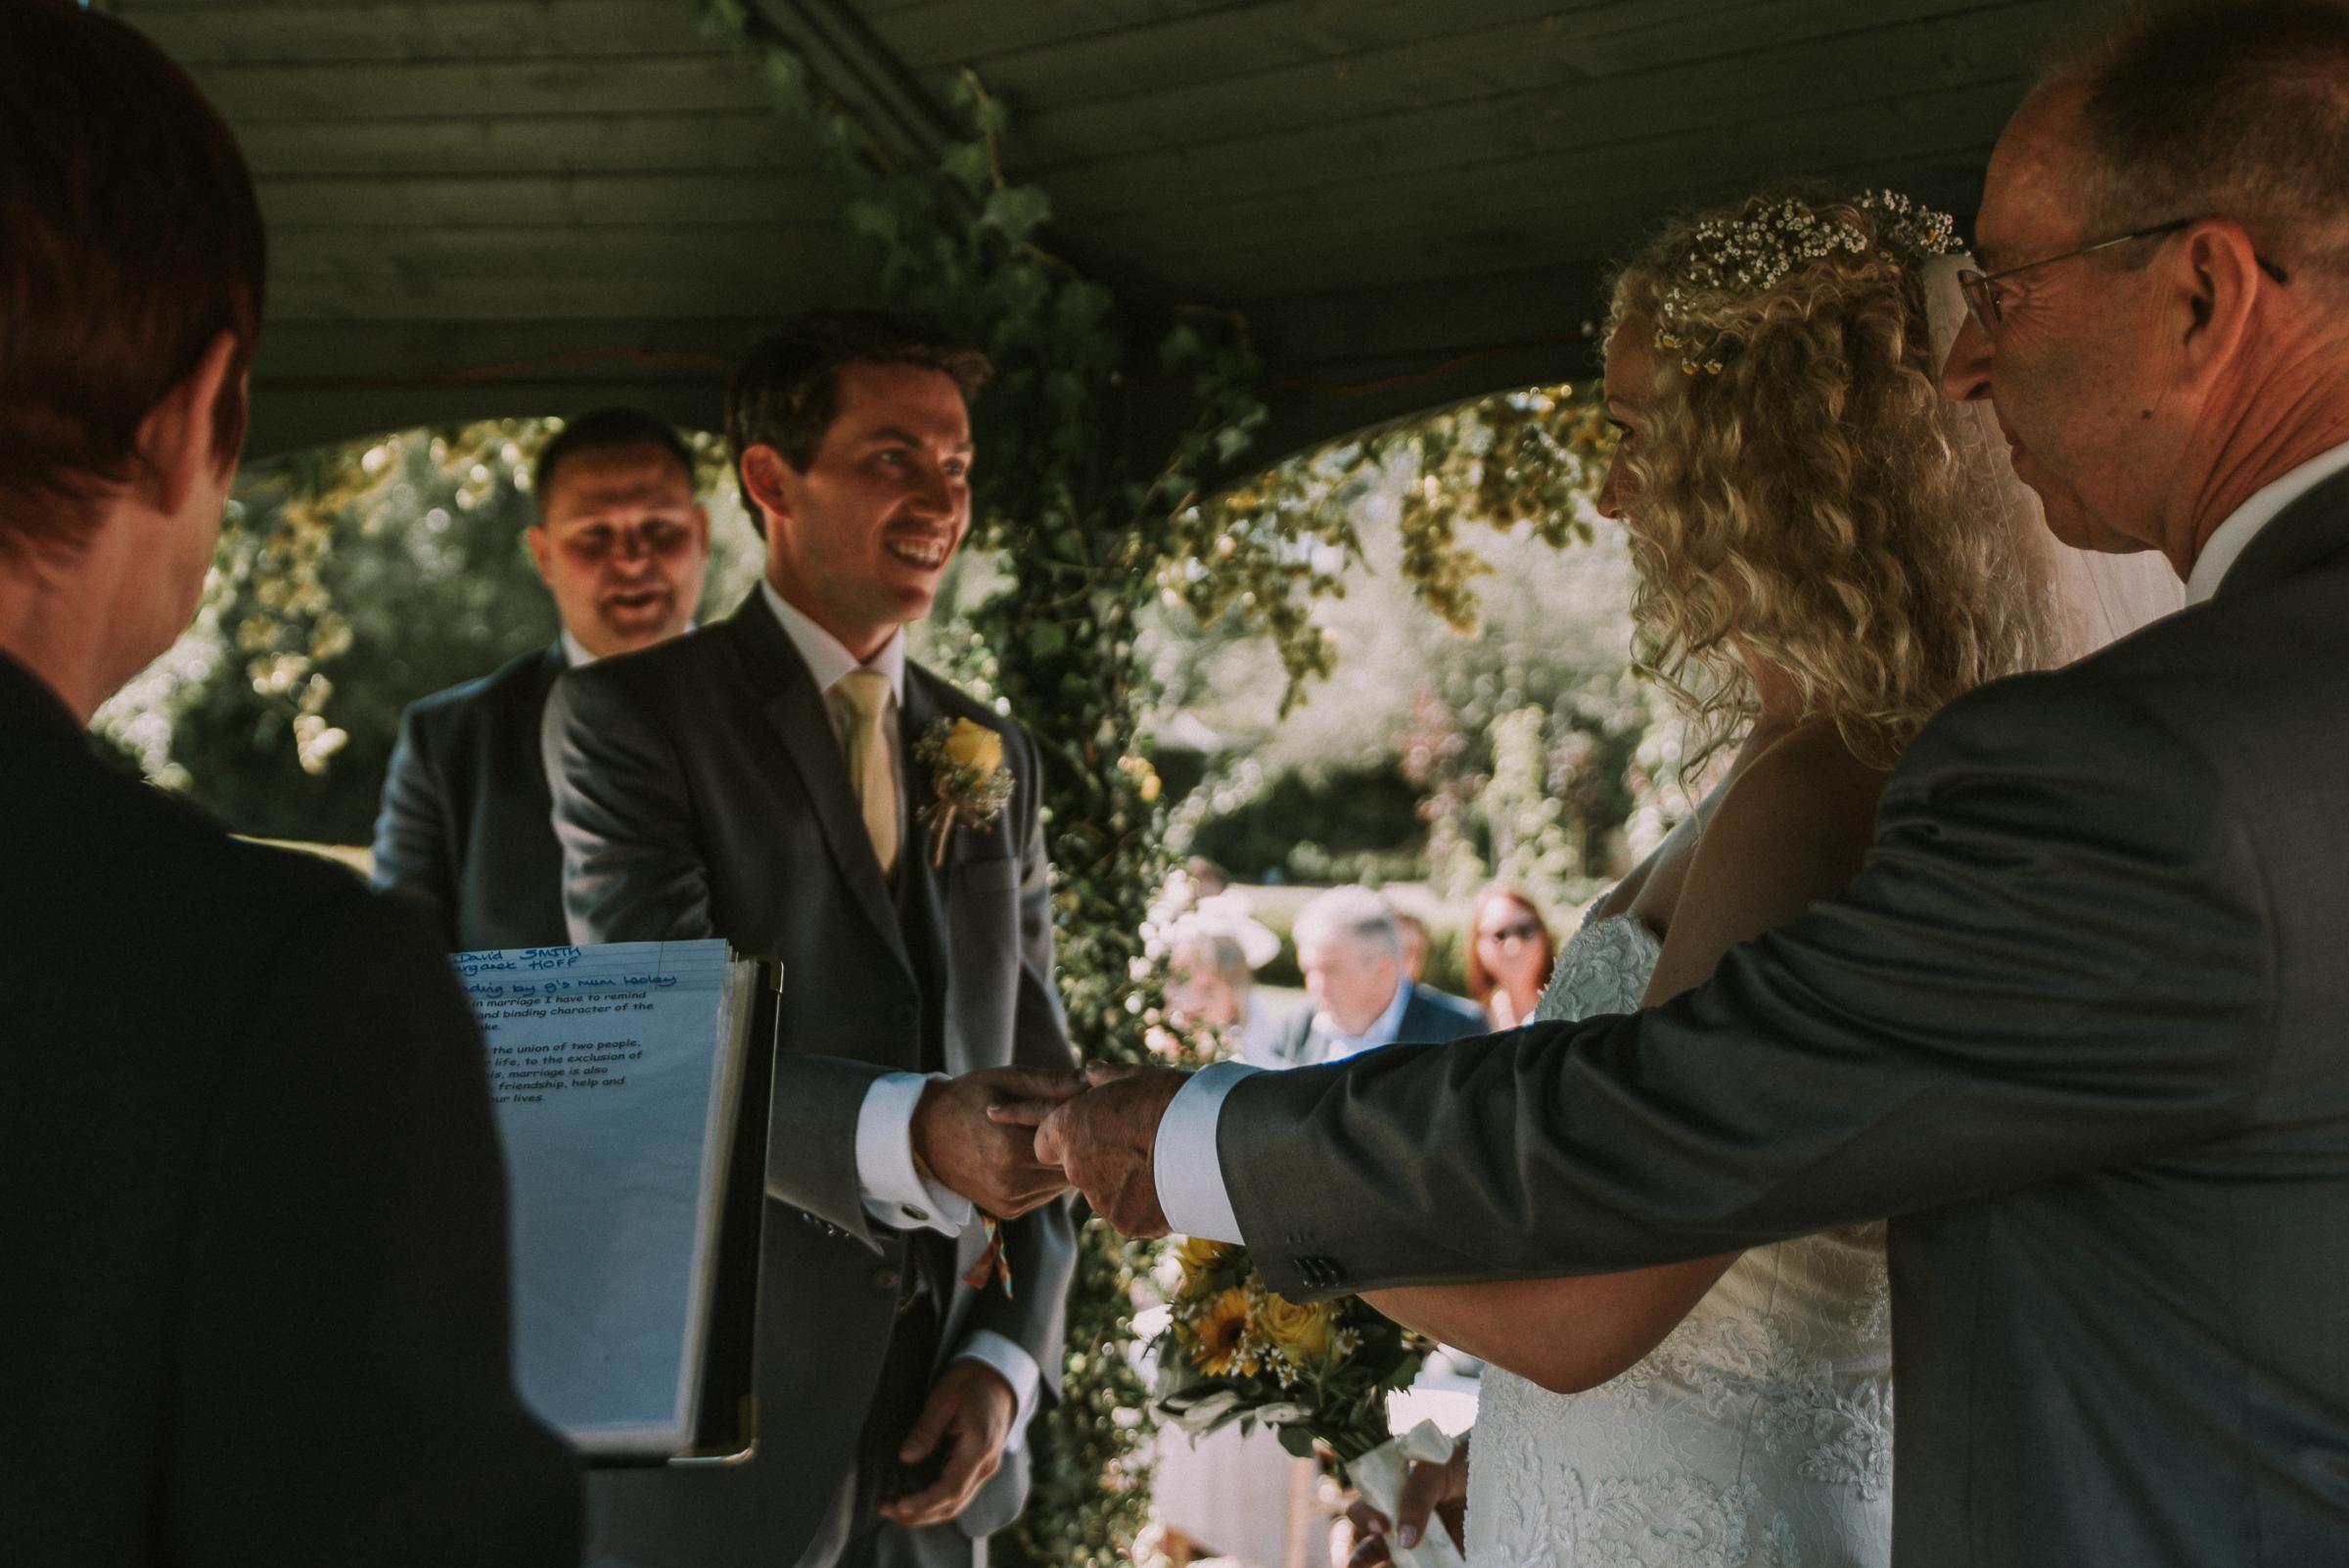 Festival Wedding Photography Secret Garden Maidstone Kent Jay Tunbridge Photorgaphic Co-24.jpg